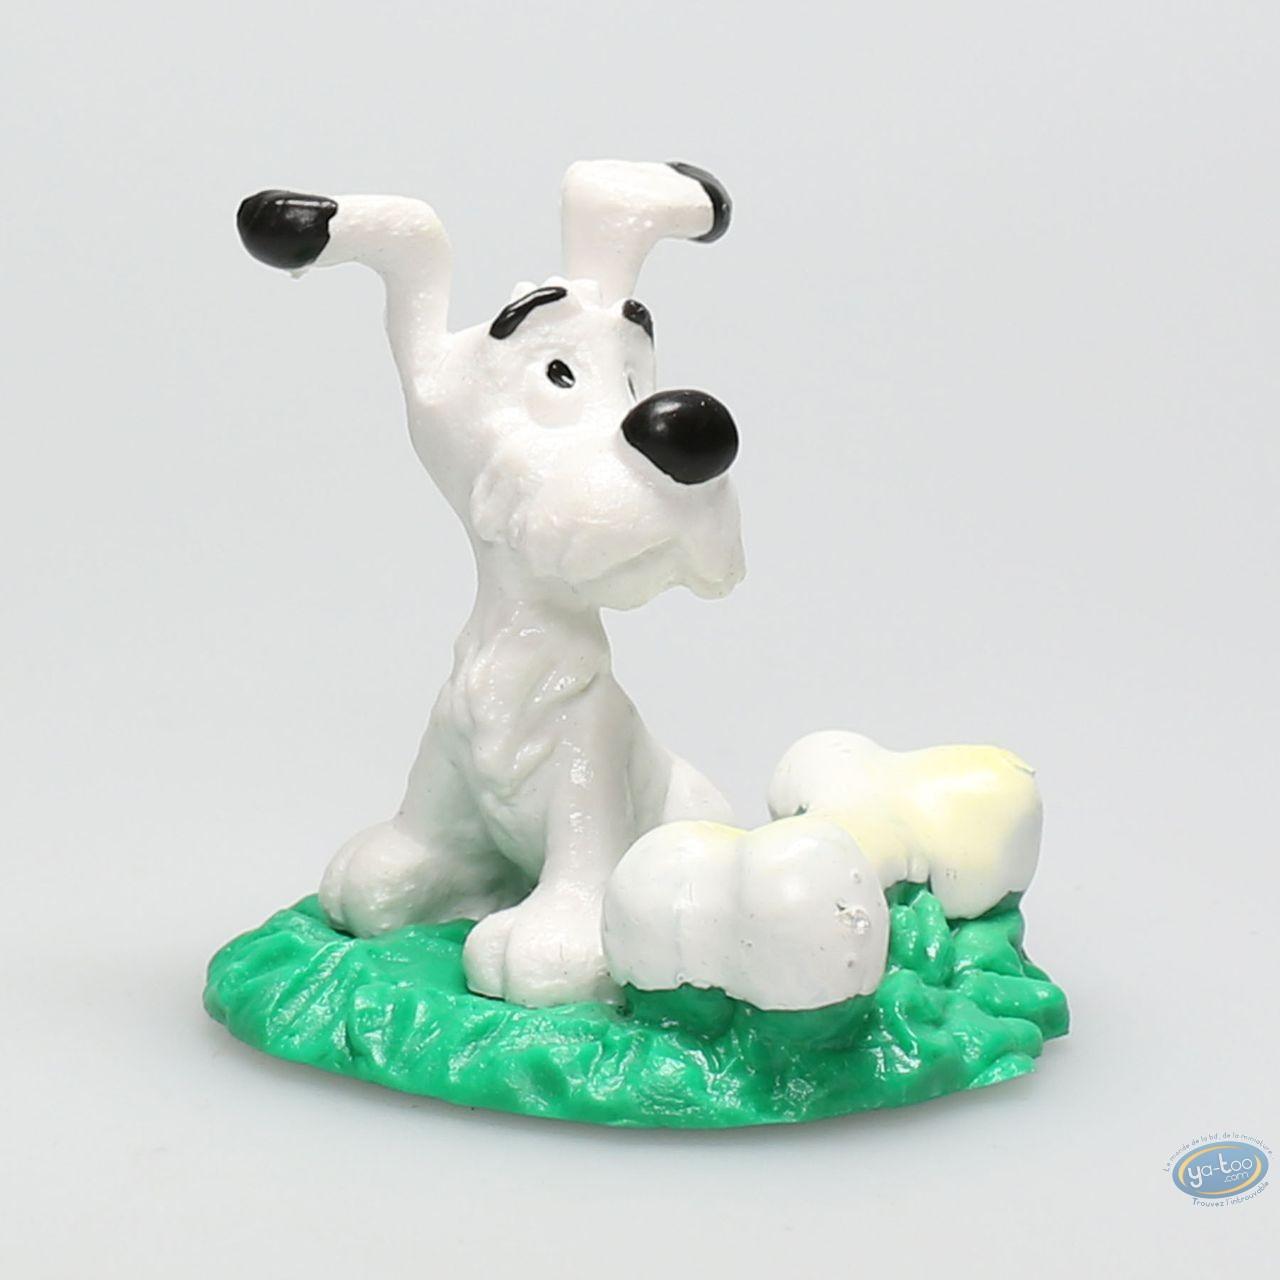 Plastic Figurine, Astérix : Dogmatix sitting with his bone